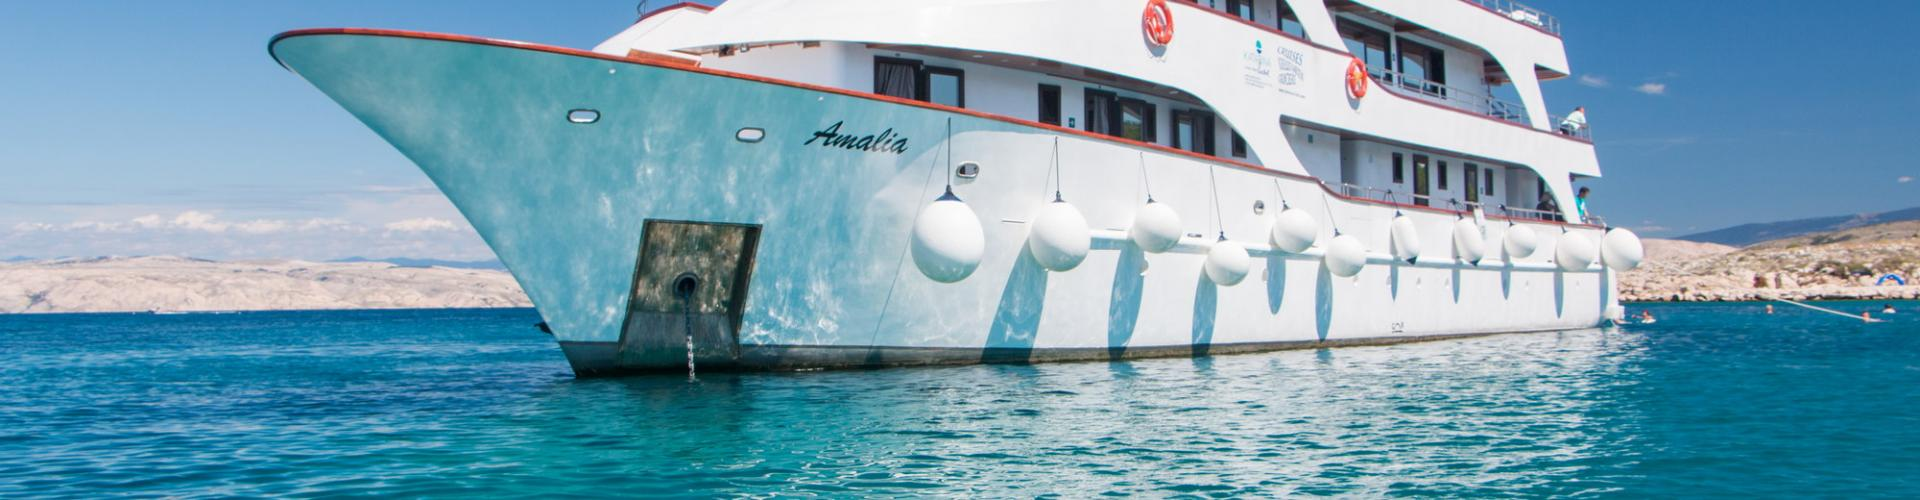 Premium Superior Kreuzfahrtschiff MV Amalia- Motoryacht